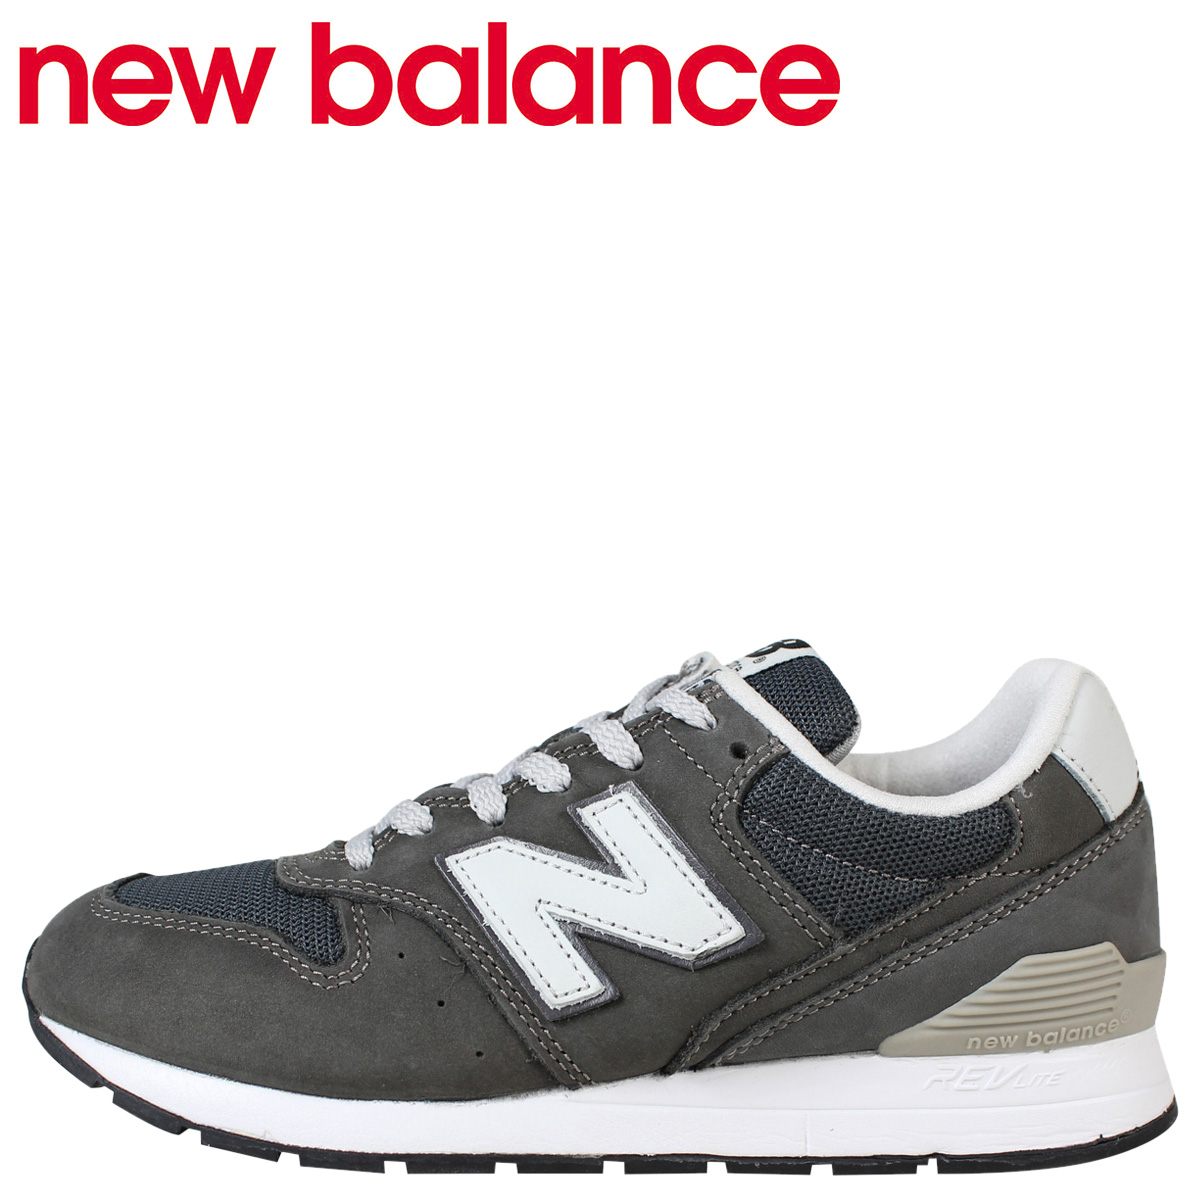 15060a90080 SneaK Online Shop  New Balance new balance 996 lady s men s sneakers ...